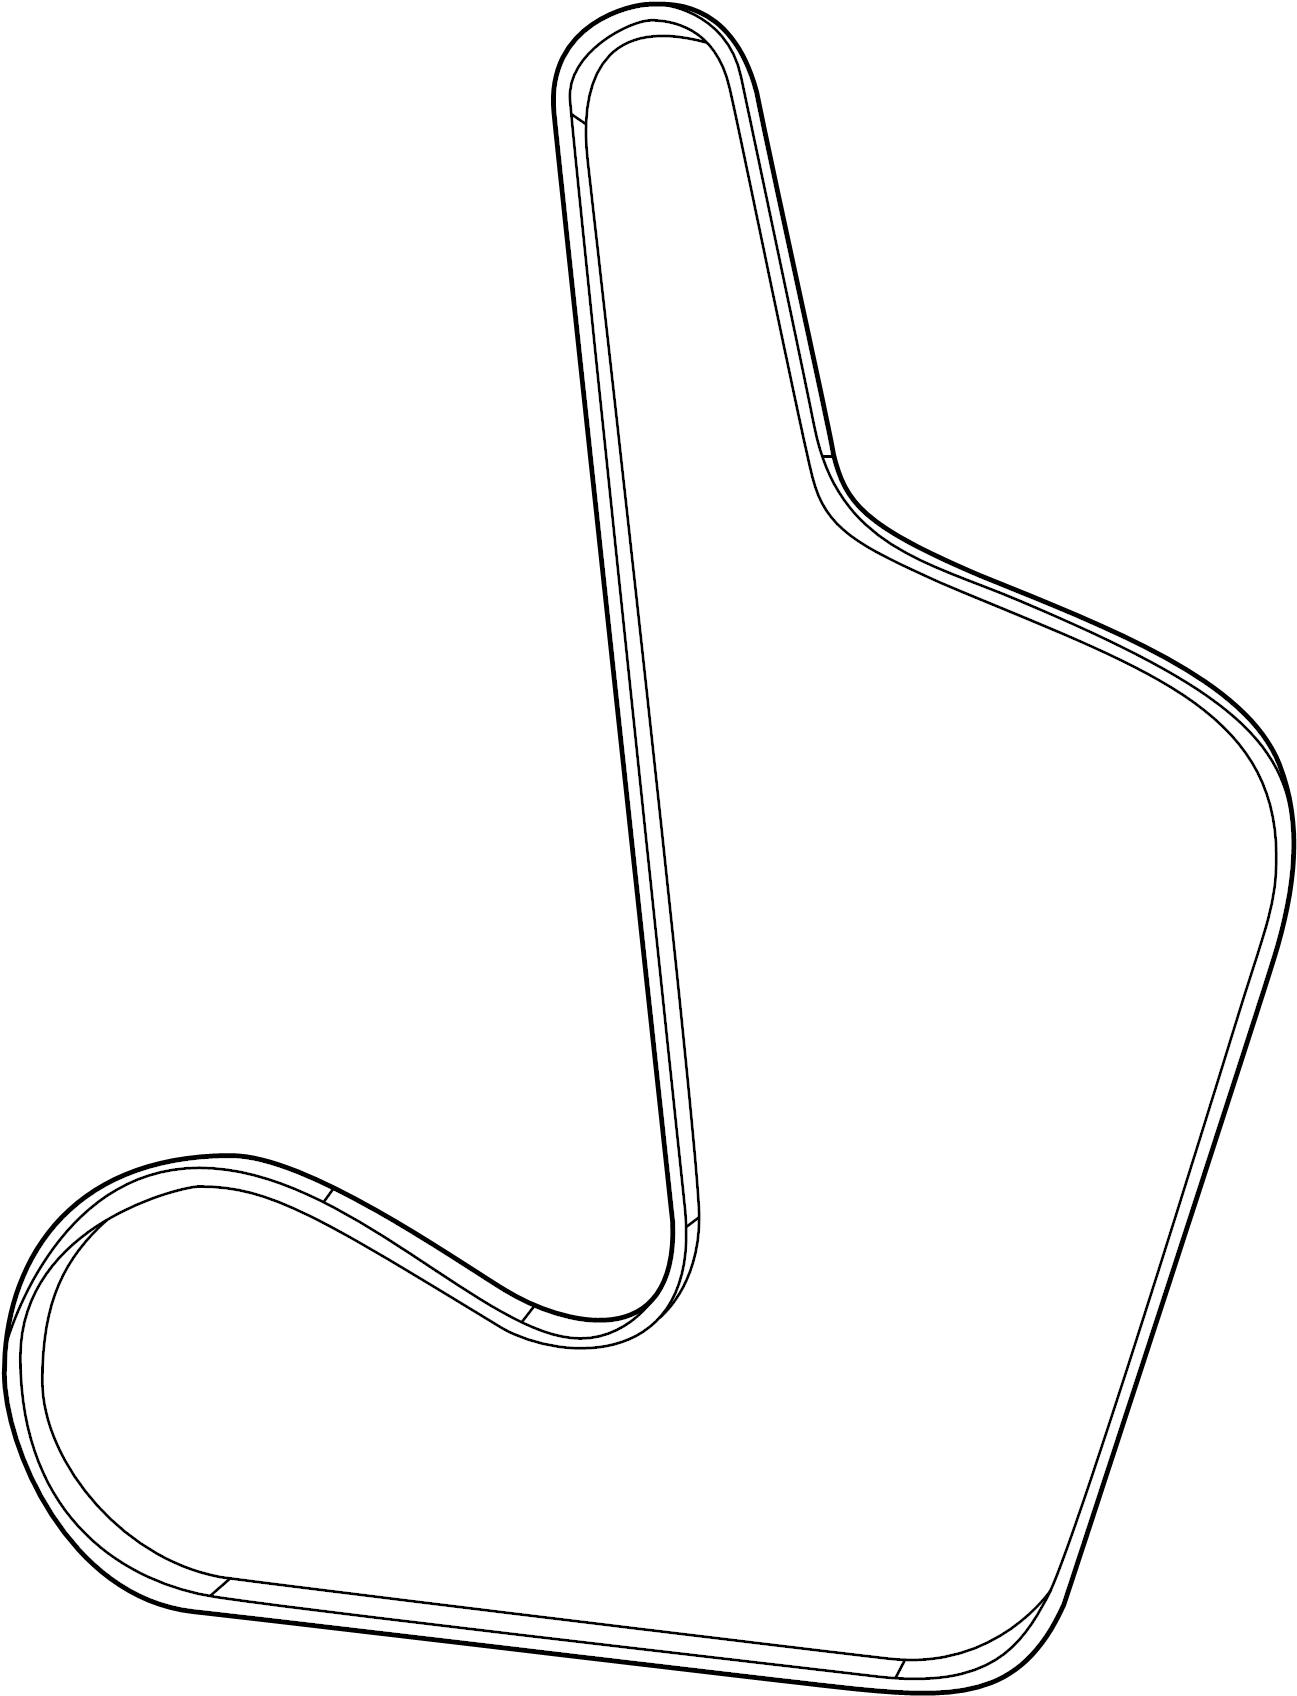 tags: #1986 chevy 454 belt diagram#1974 corvette big block belt diagram#v8  belt routing diagrams#2004 corvette belt diagram#454 engine belt diagrams# big